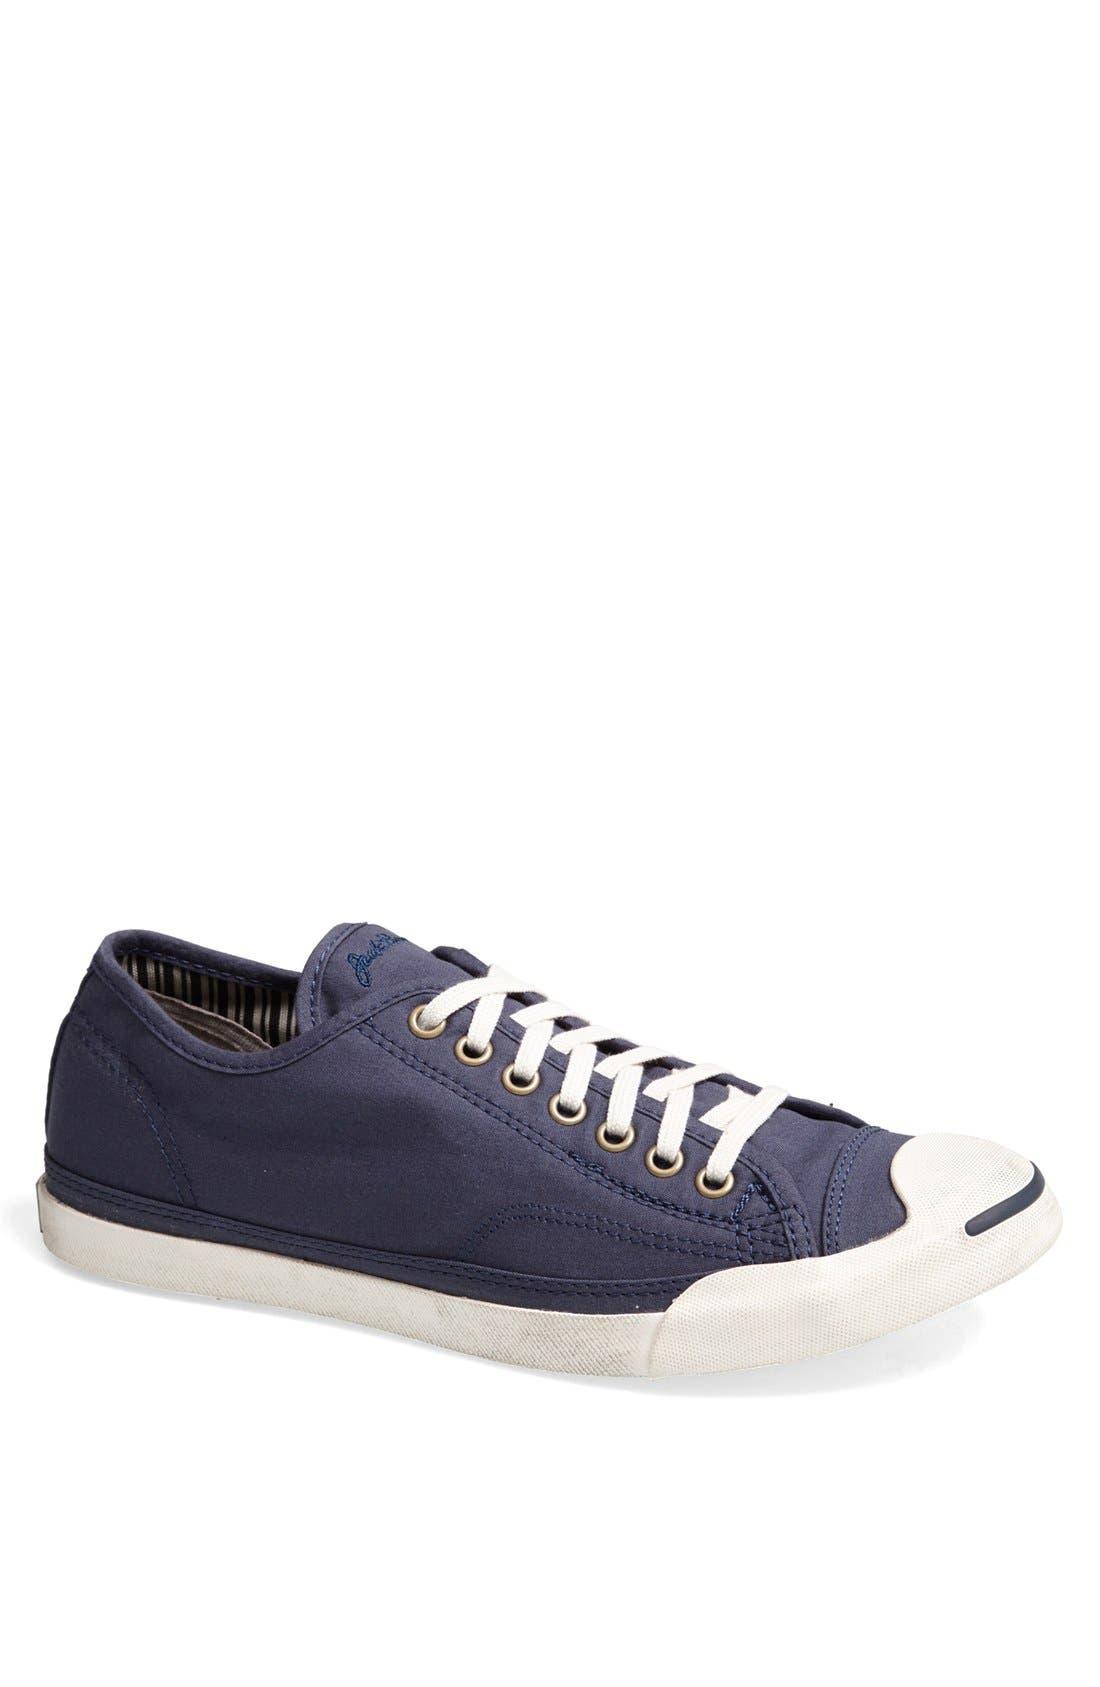 Alternate Image 1 Selected - Converse 'Jack Purcell - Low' Sneaker (Men)